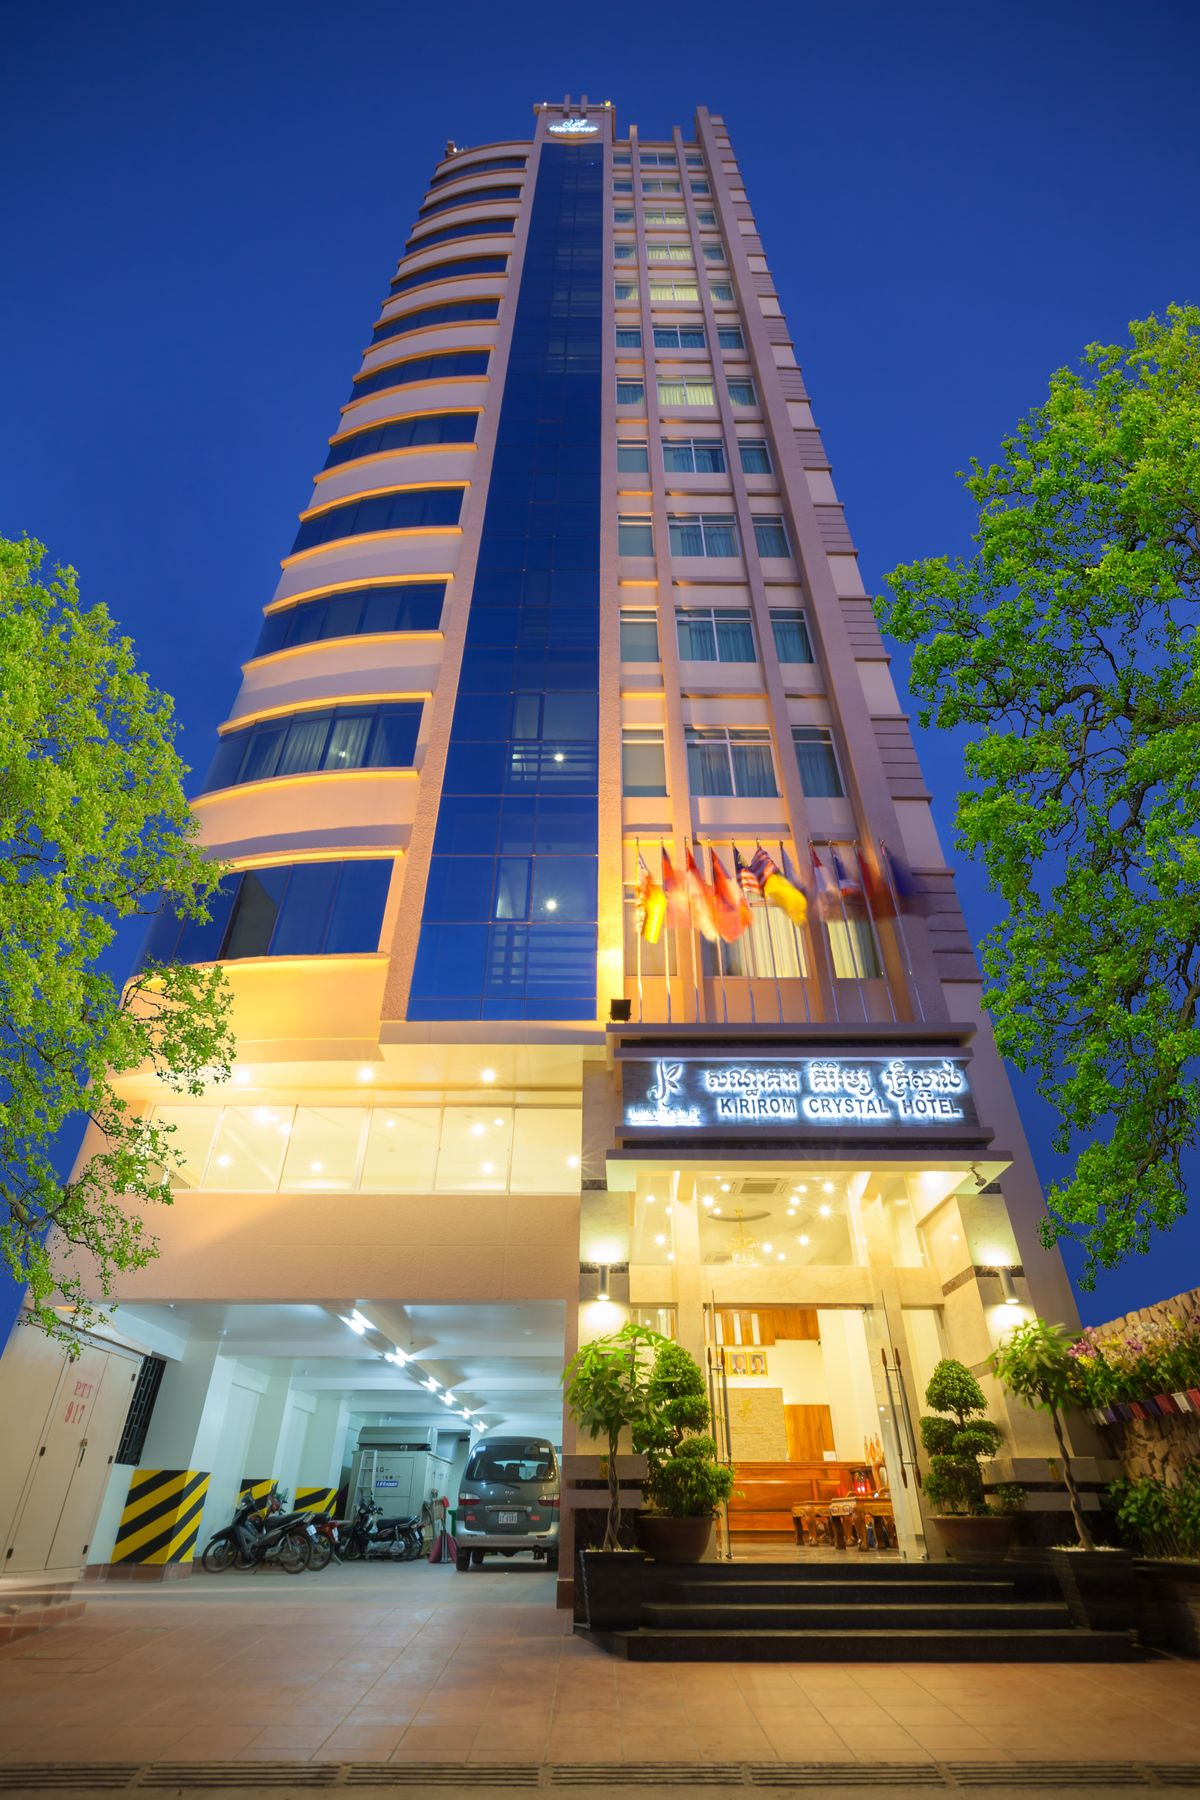 Kirirom Crystal Hotel